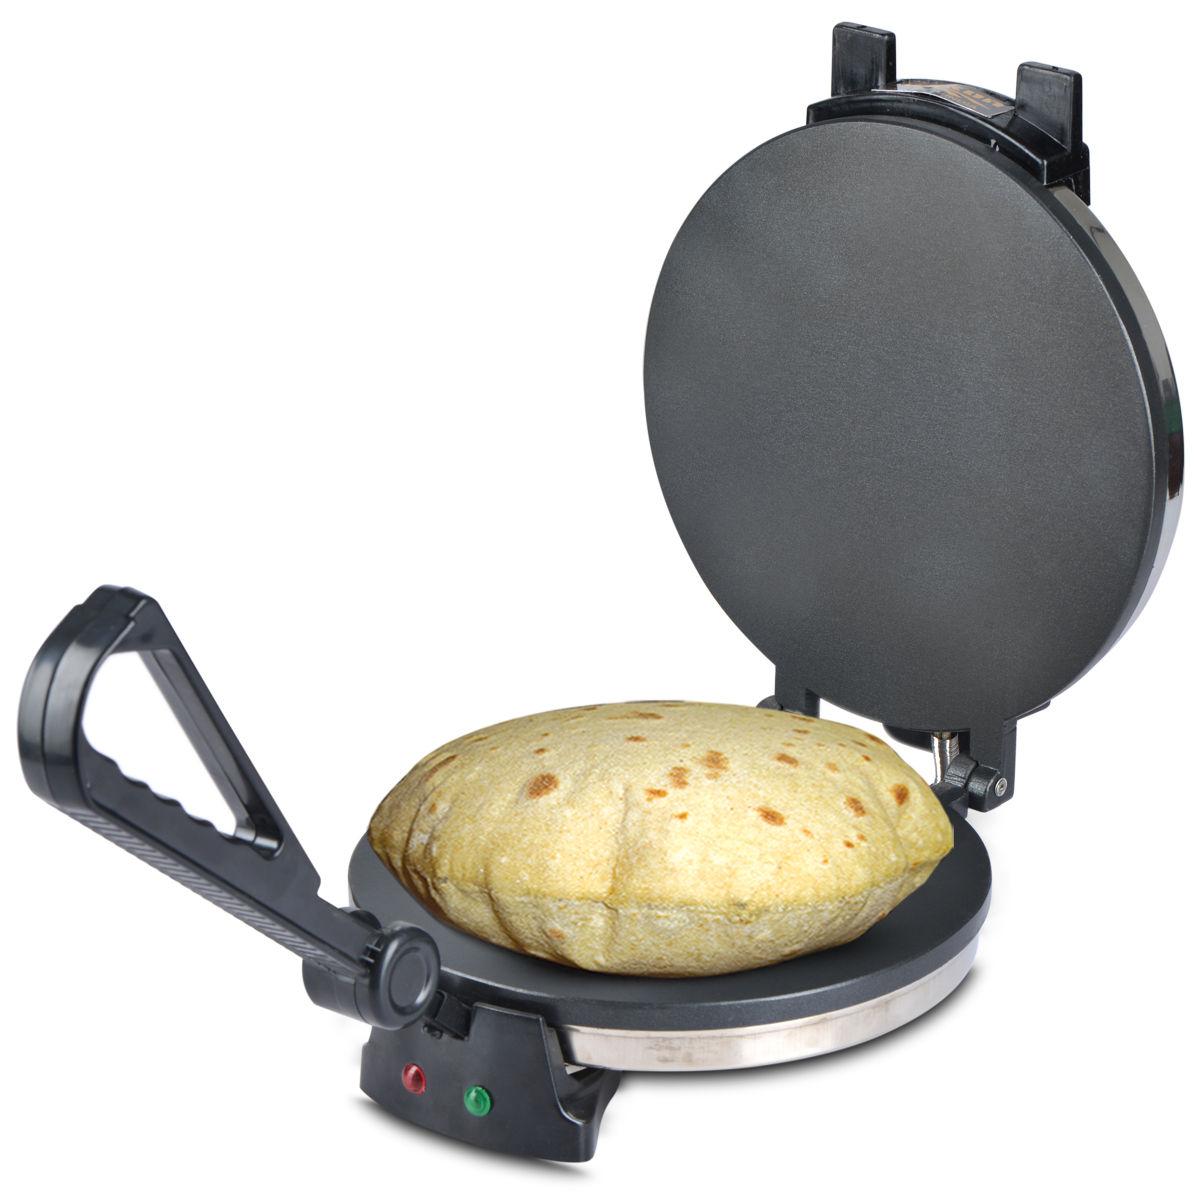 Buy jumbo roti maker online at best price in india on for Online home maker